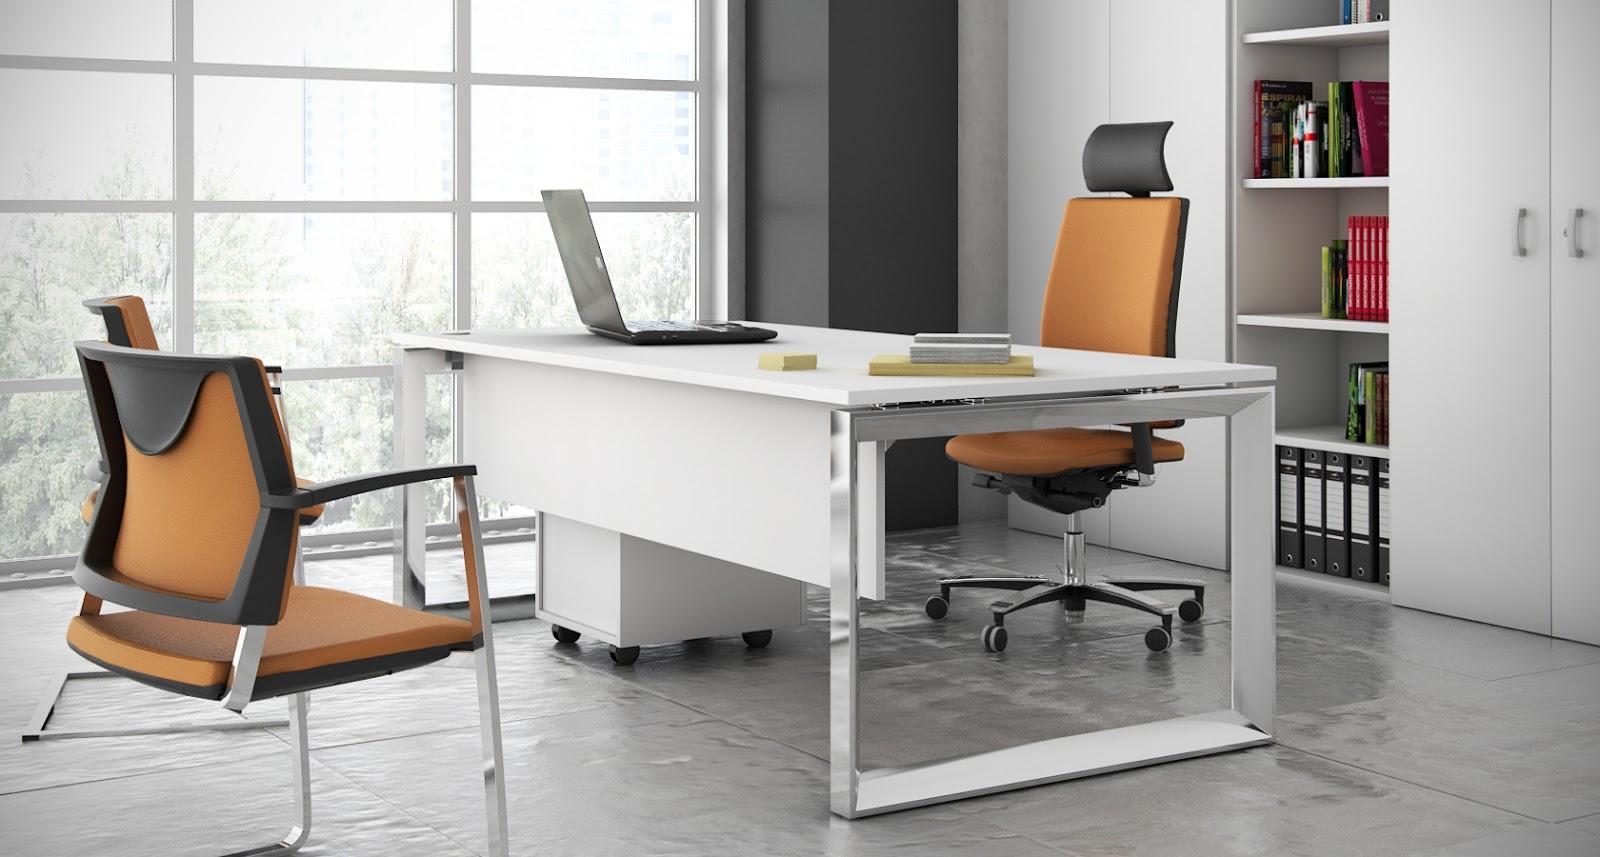 Oficina total nueva serie star de mobiliario for Lista de mobiliario para oficina